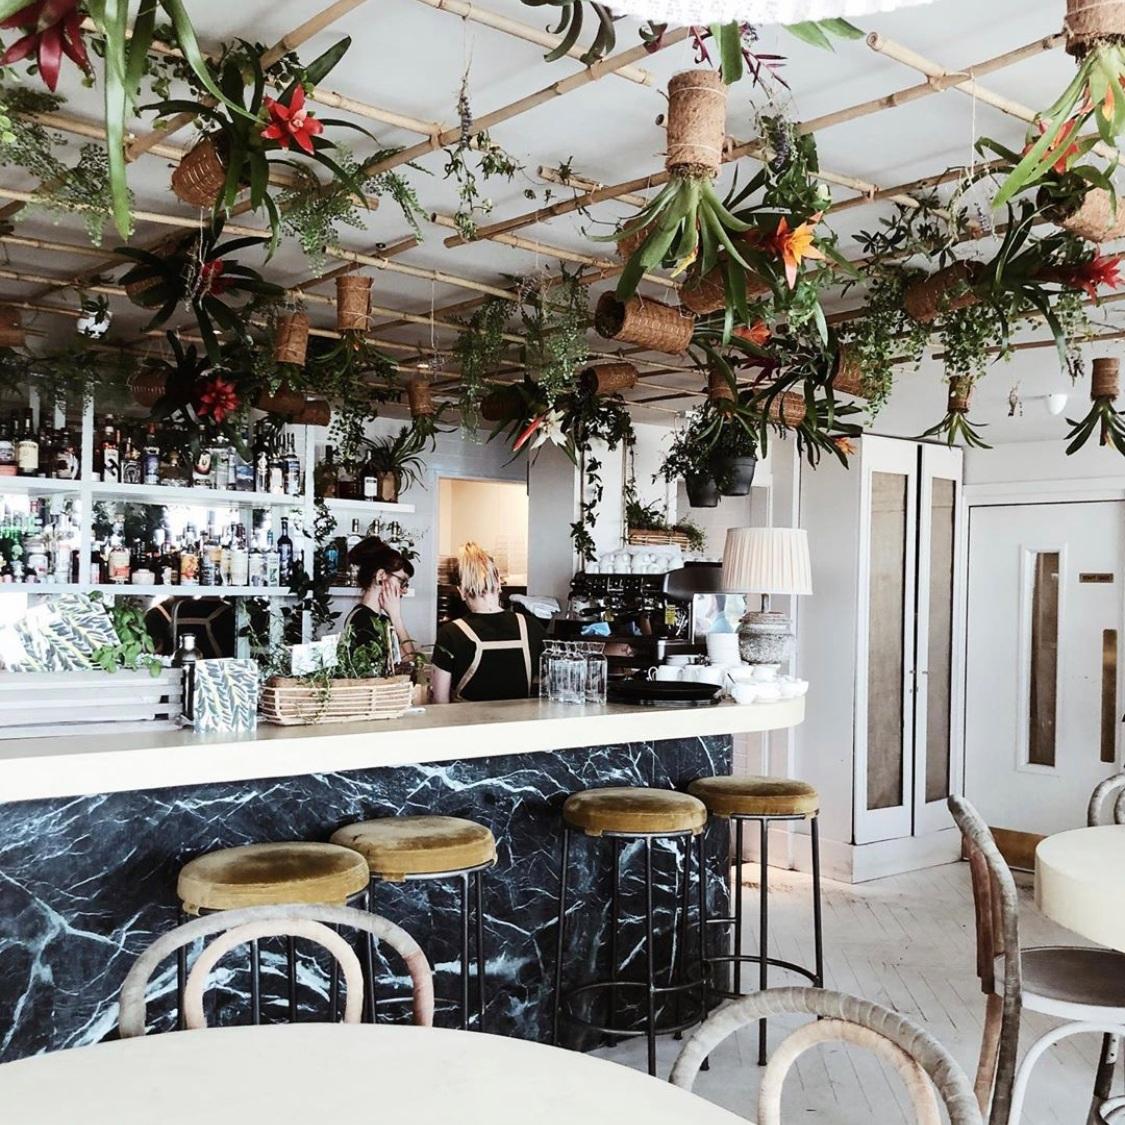 Garden Room's Living Bar - Botanical cocktails in the sky